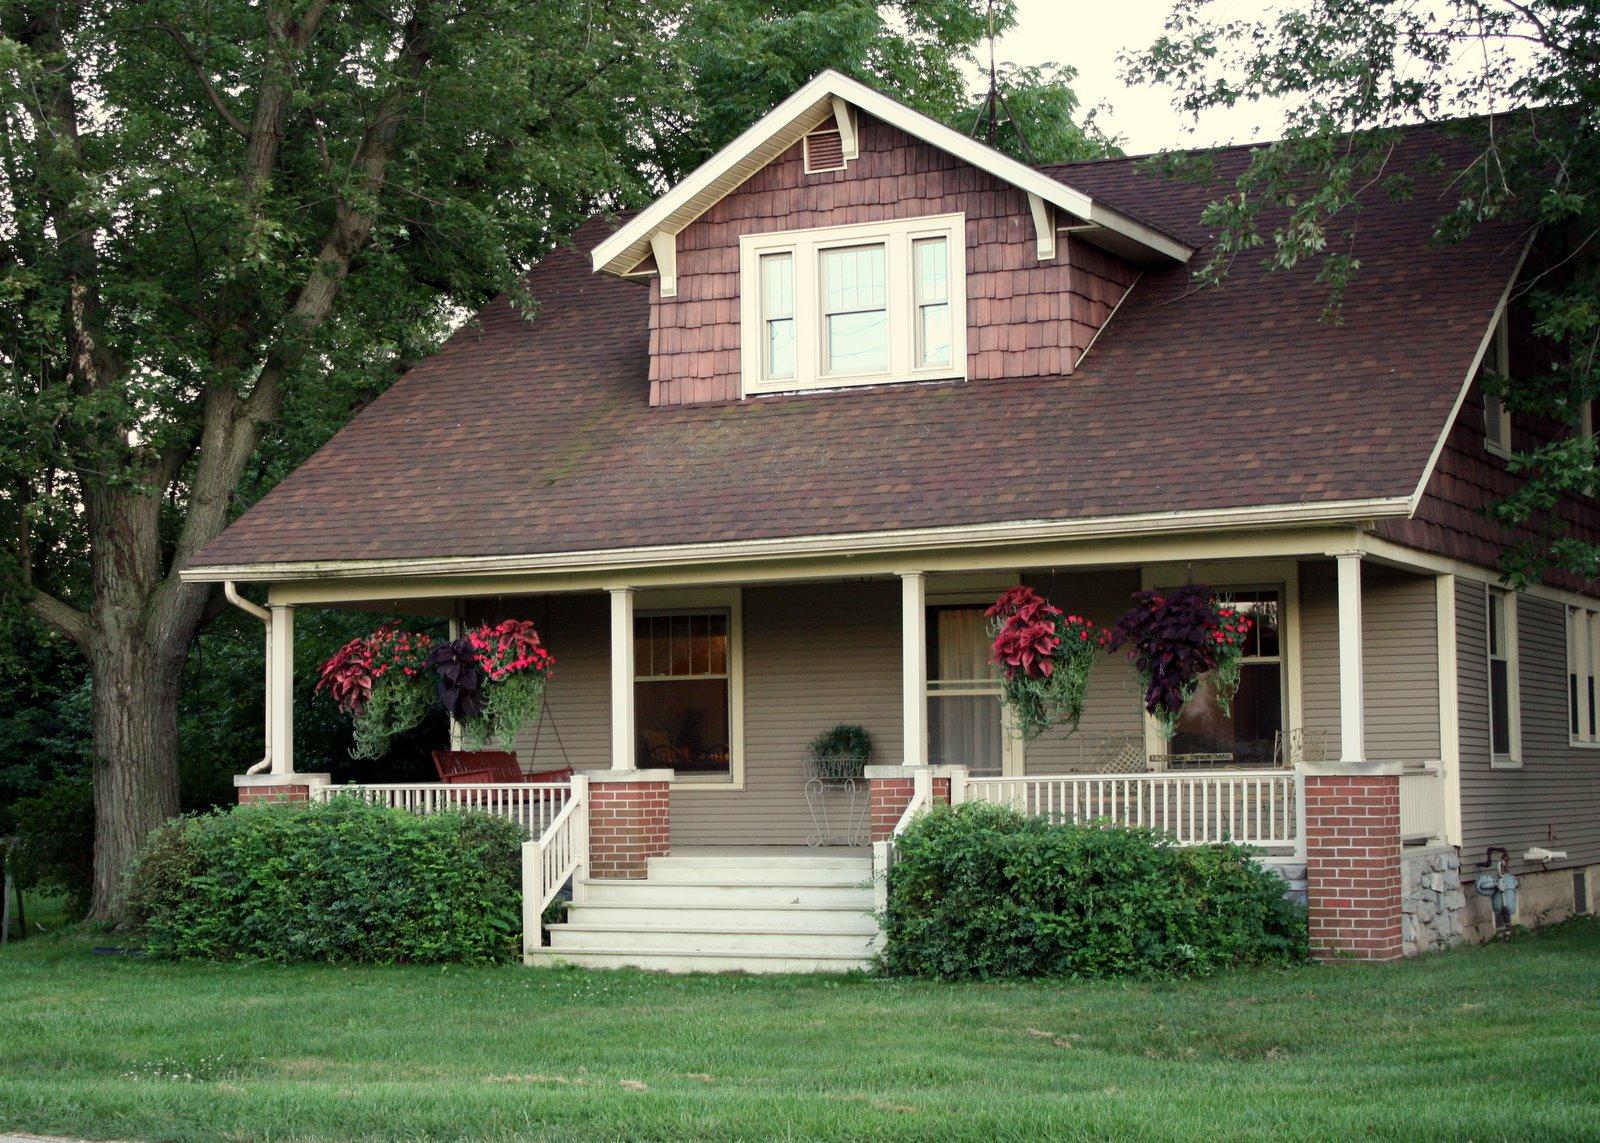 Cottage Style Home 2 Craft O Maniac